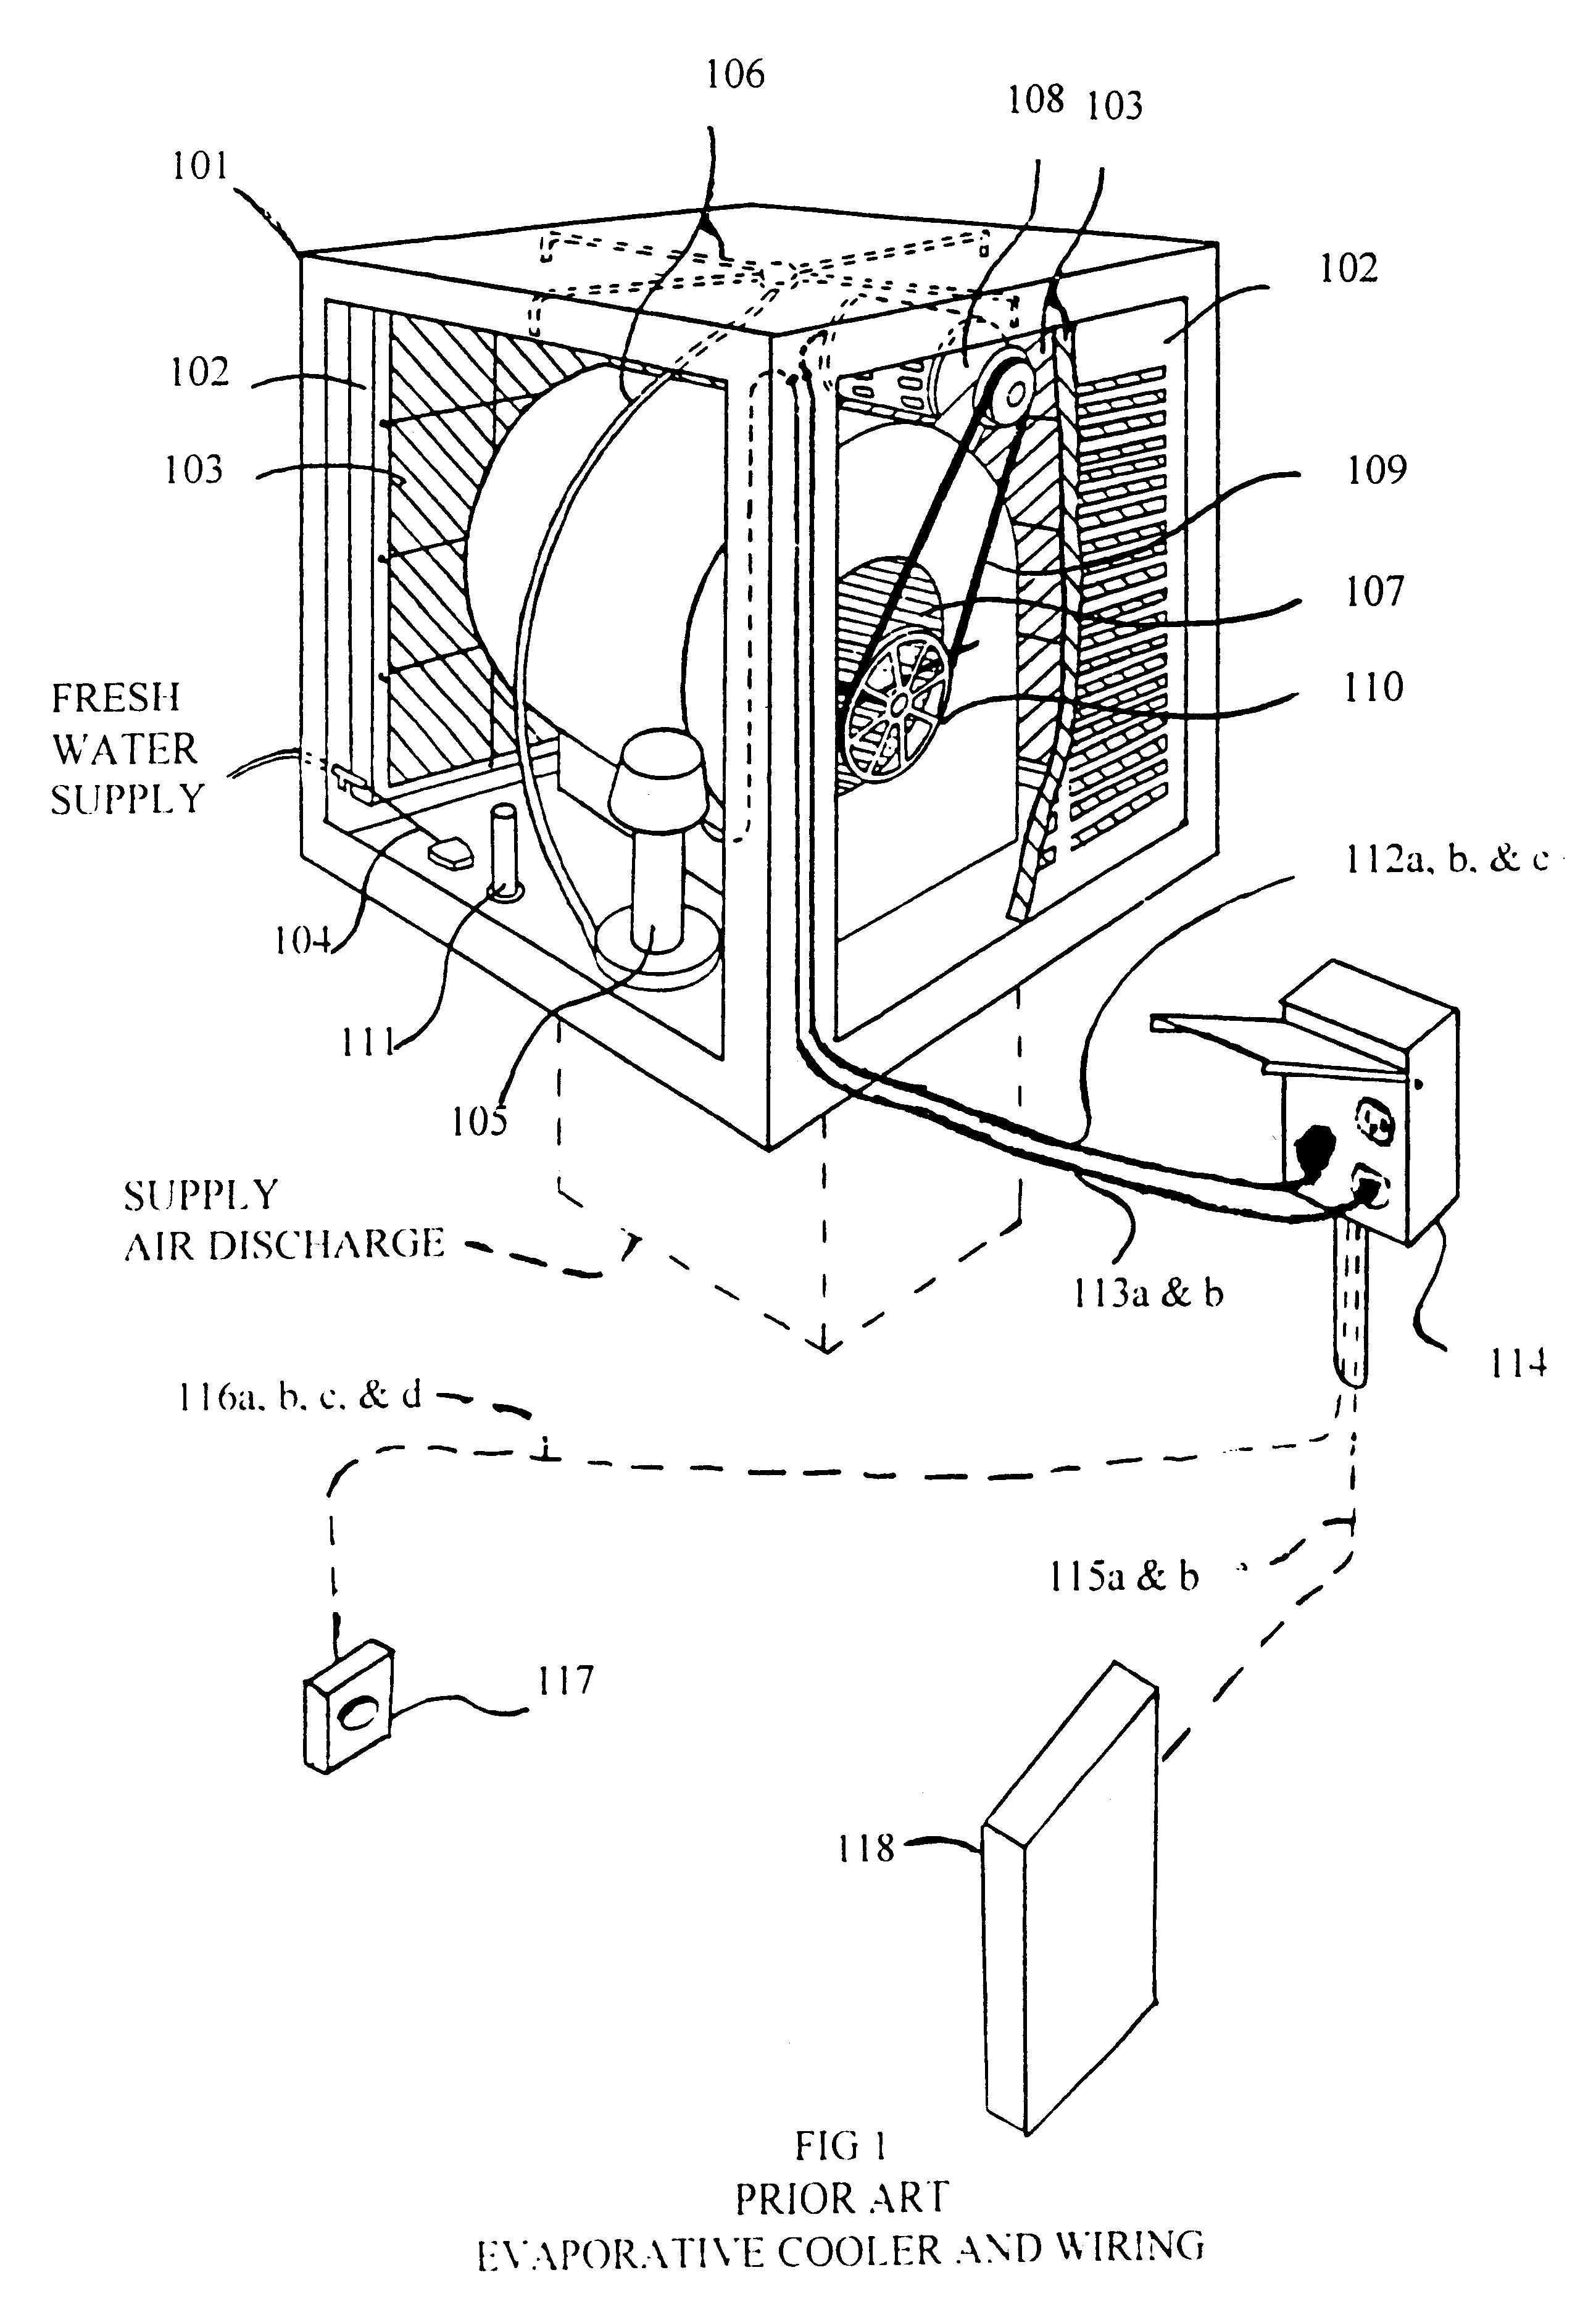 Diagram Evaporative Cooler Wiring Diagrams Diagram Swamp Wall Switch Evaporative Cooler Wiring Diagrams